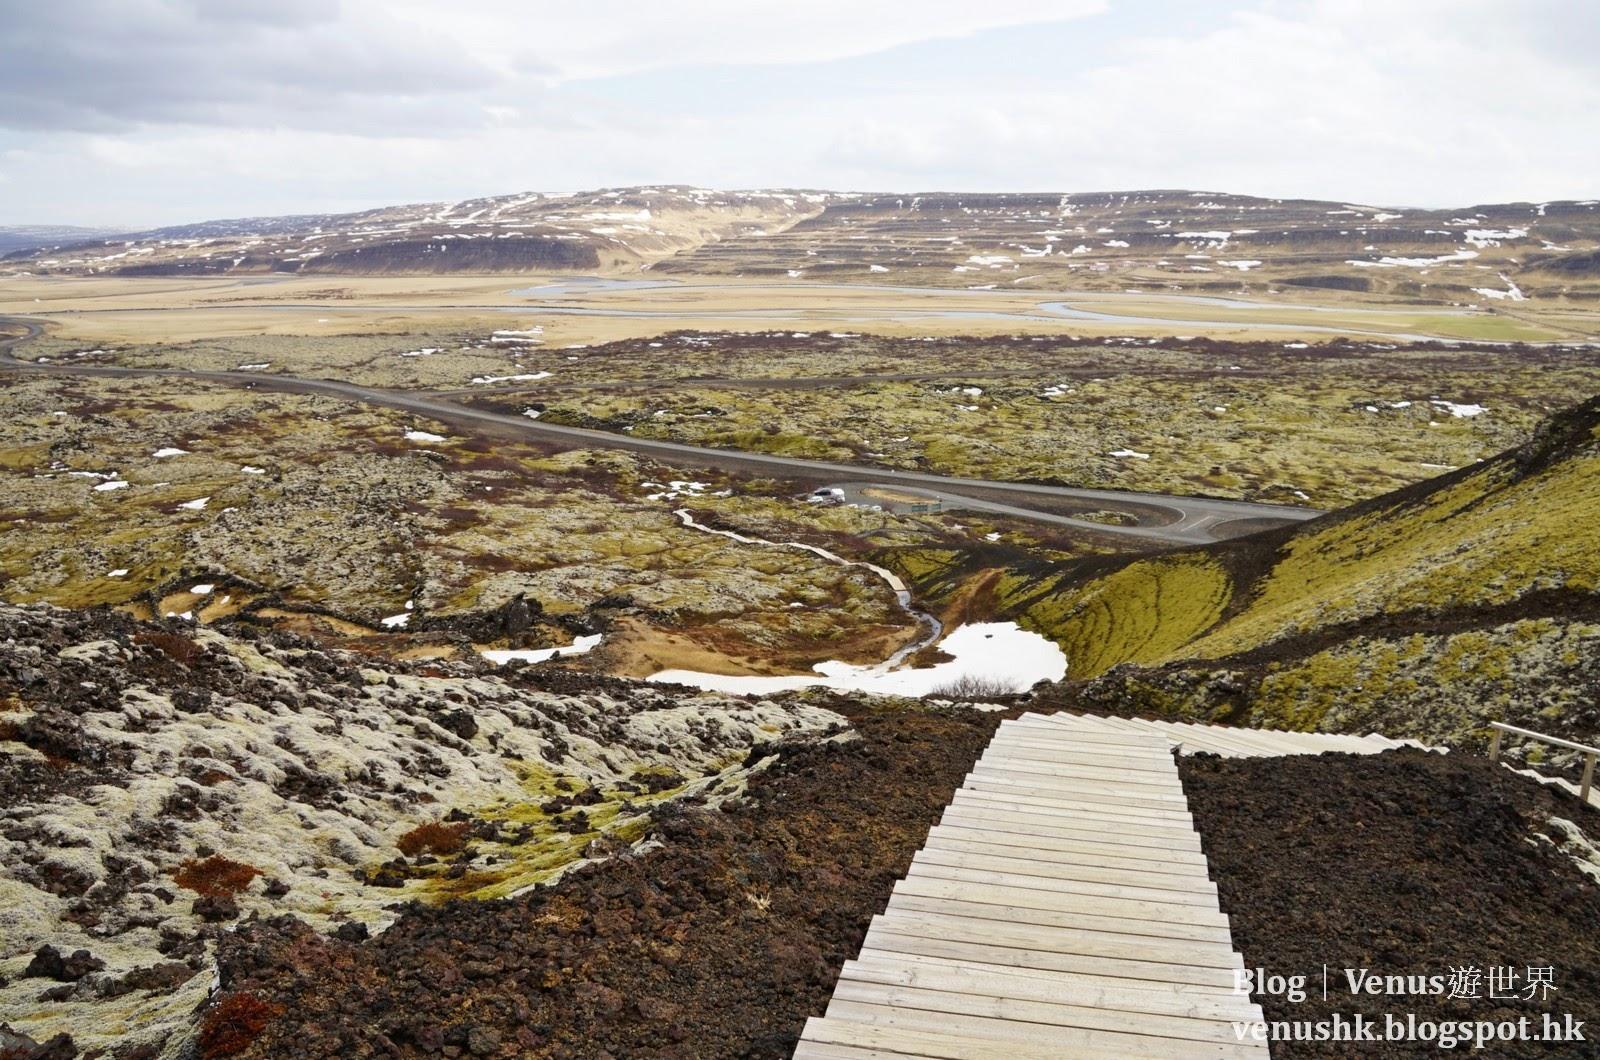 Venus遊世界: Day 2 冰島自駕遊開始